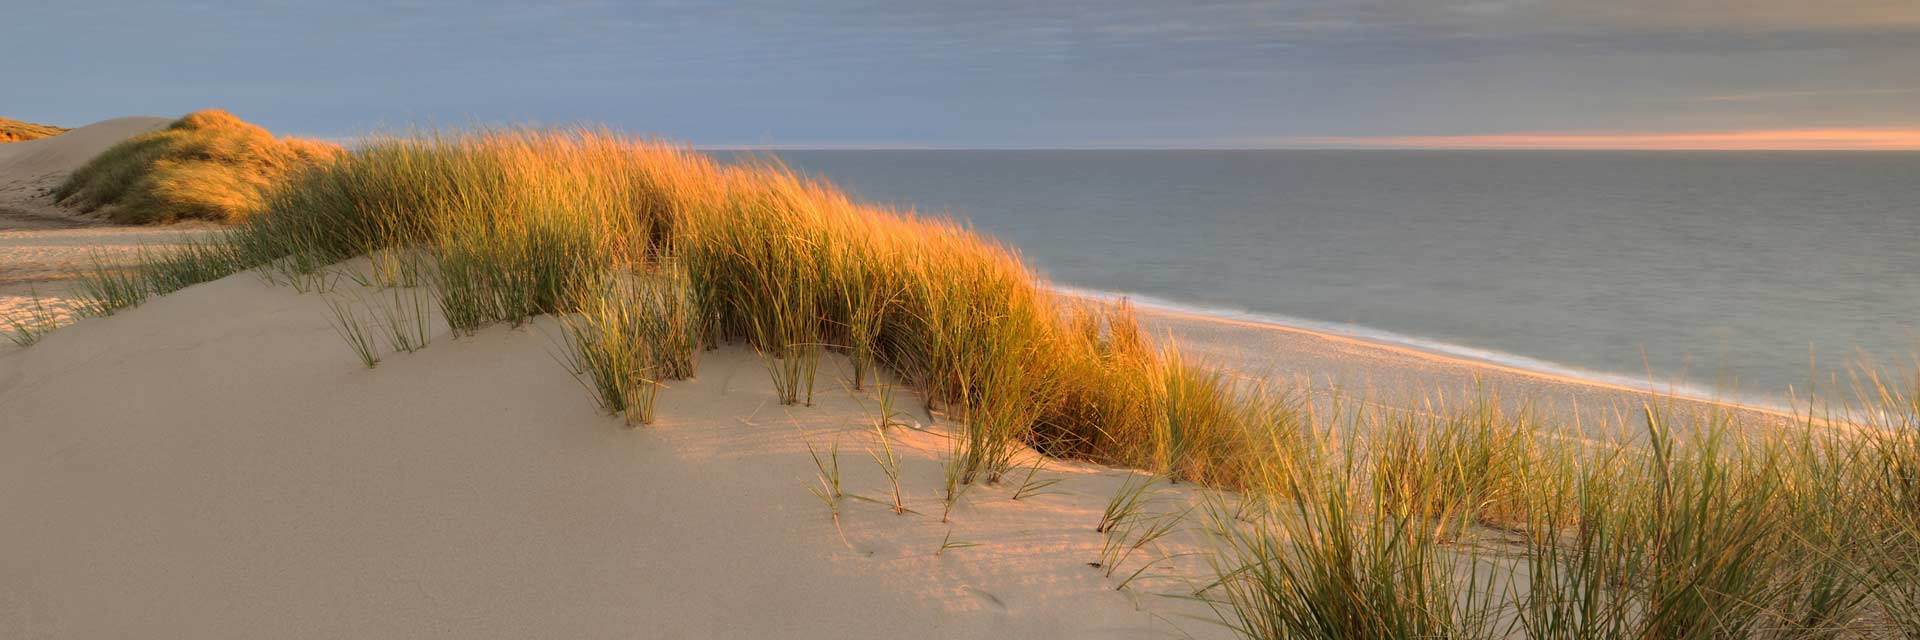 sylt-dune-nordsee-leinwandbild-arcy.jpg